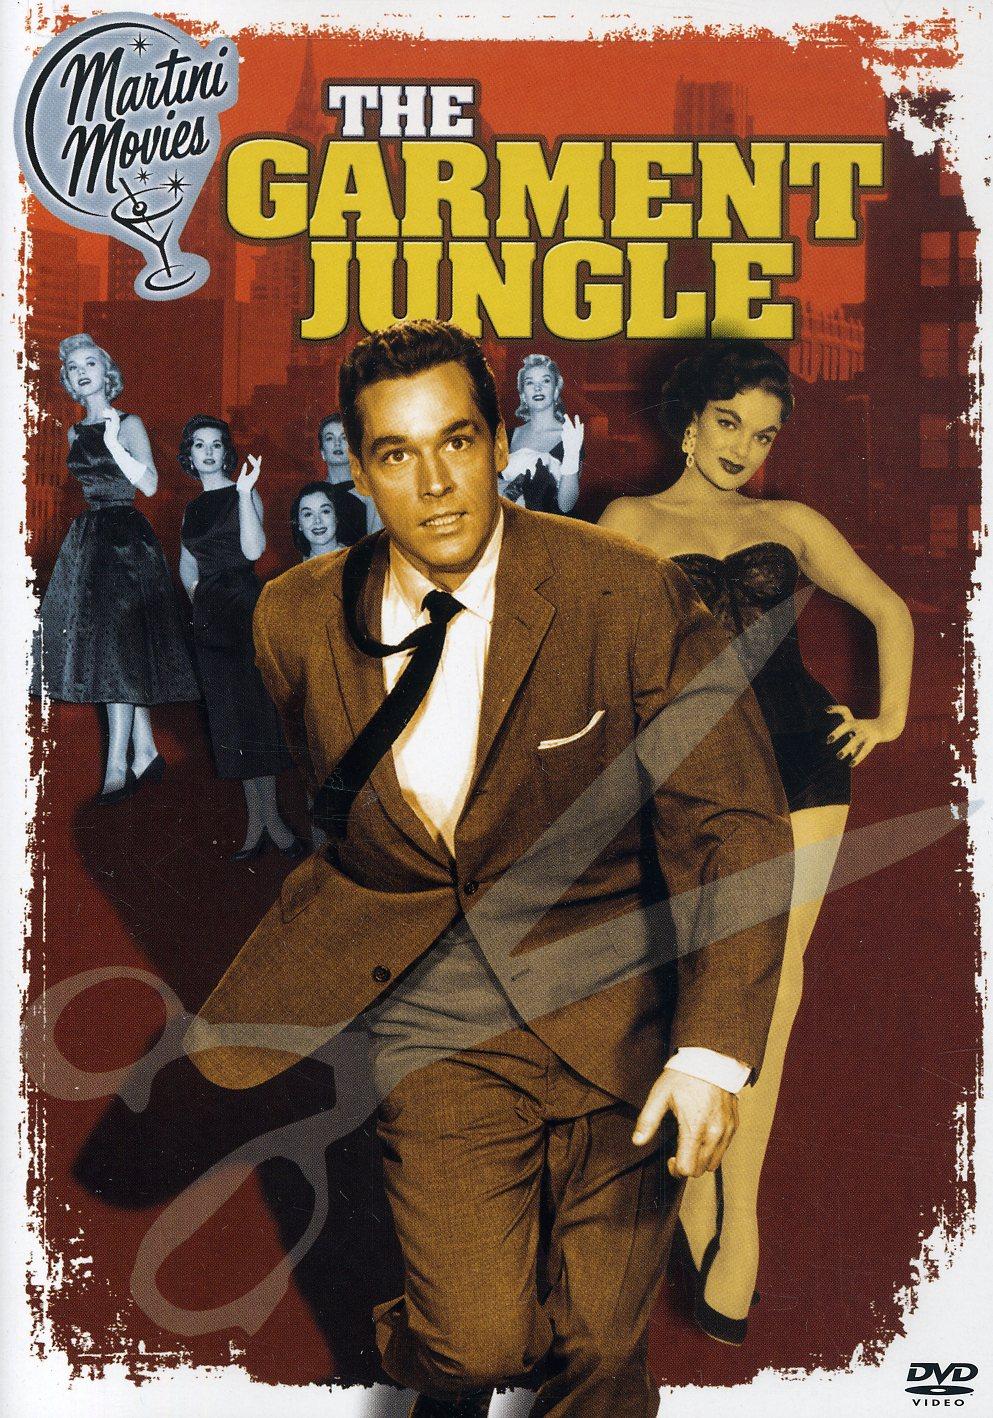 The Garment Jungle (DVD)